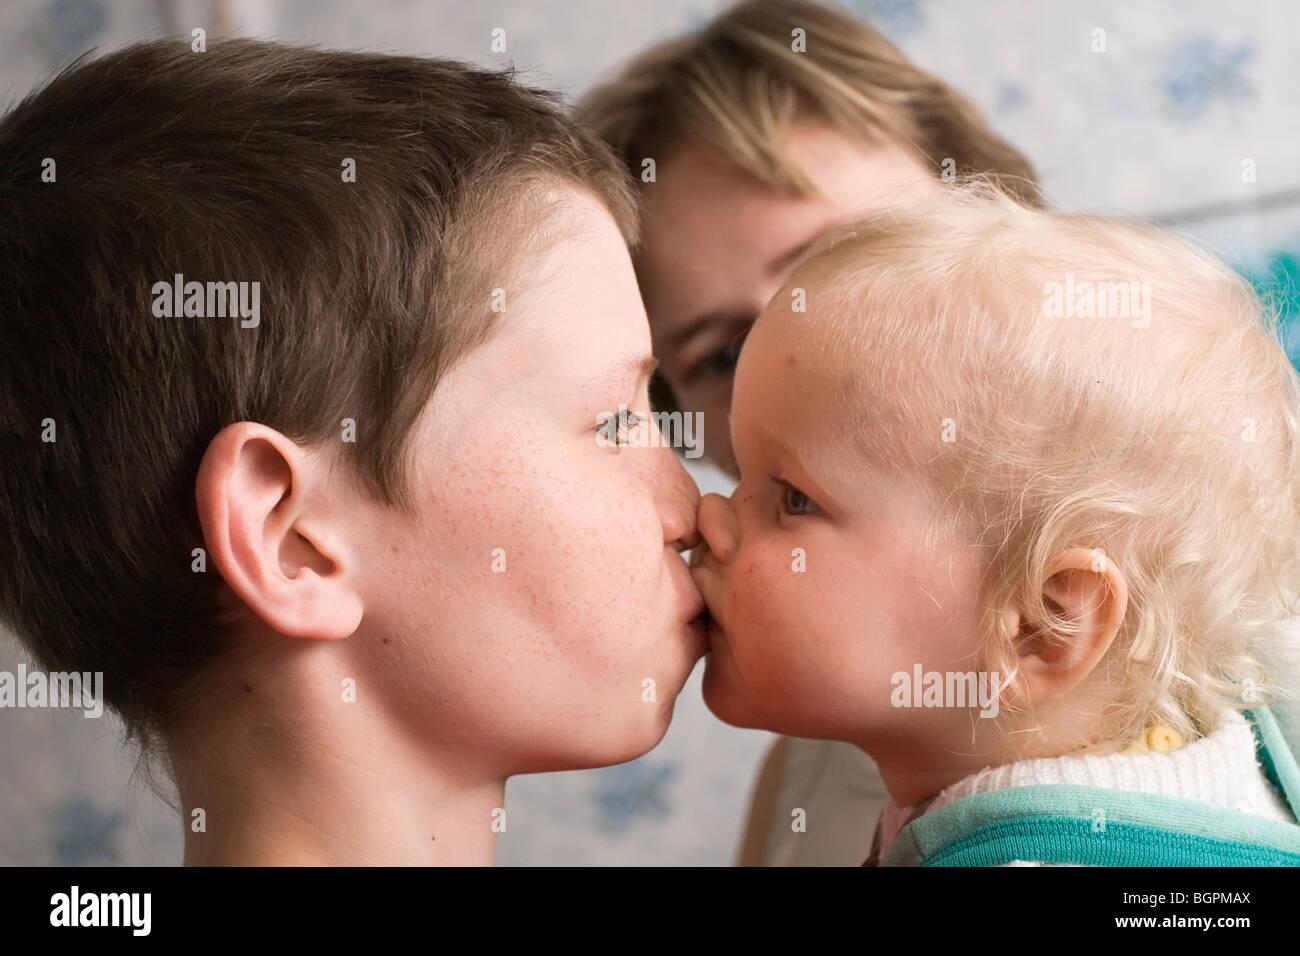 Boy kissing girl on lips in a bath, black girl jewelry